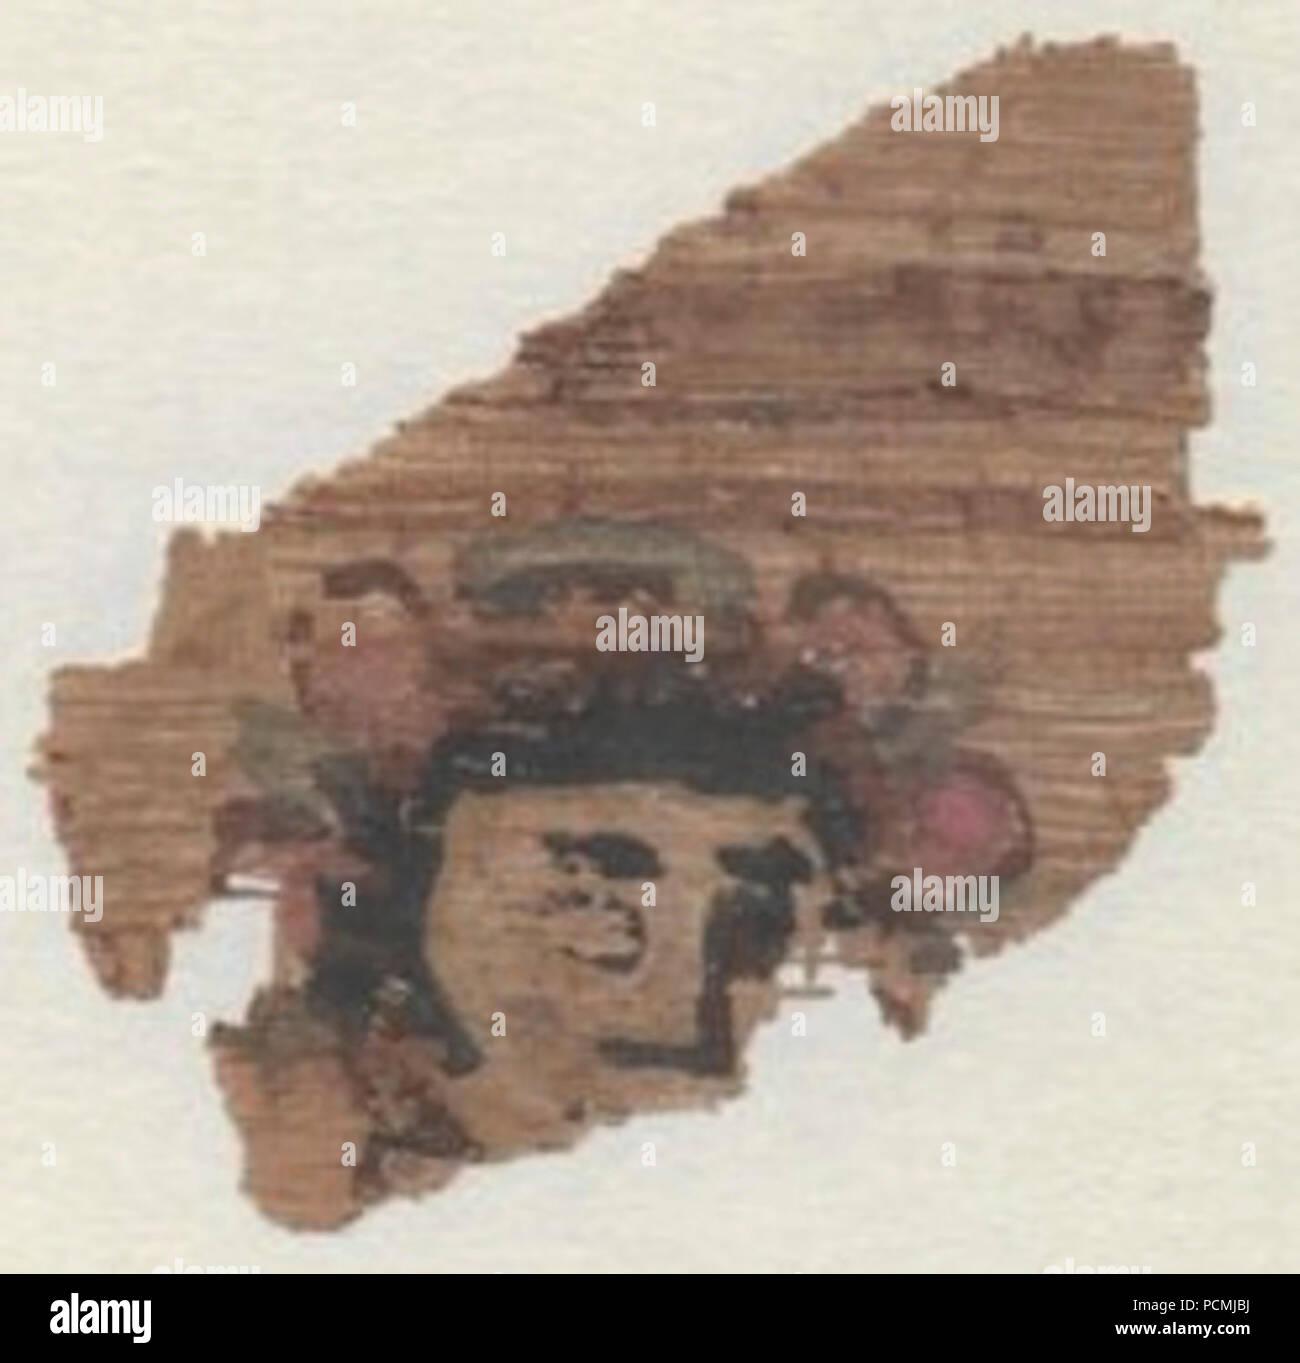 Alexandrinische Welt Chronik Wien Fragment Stockfoto Bild